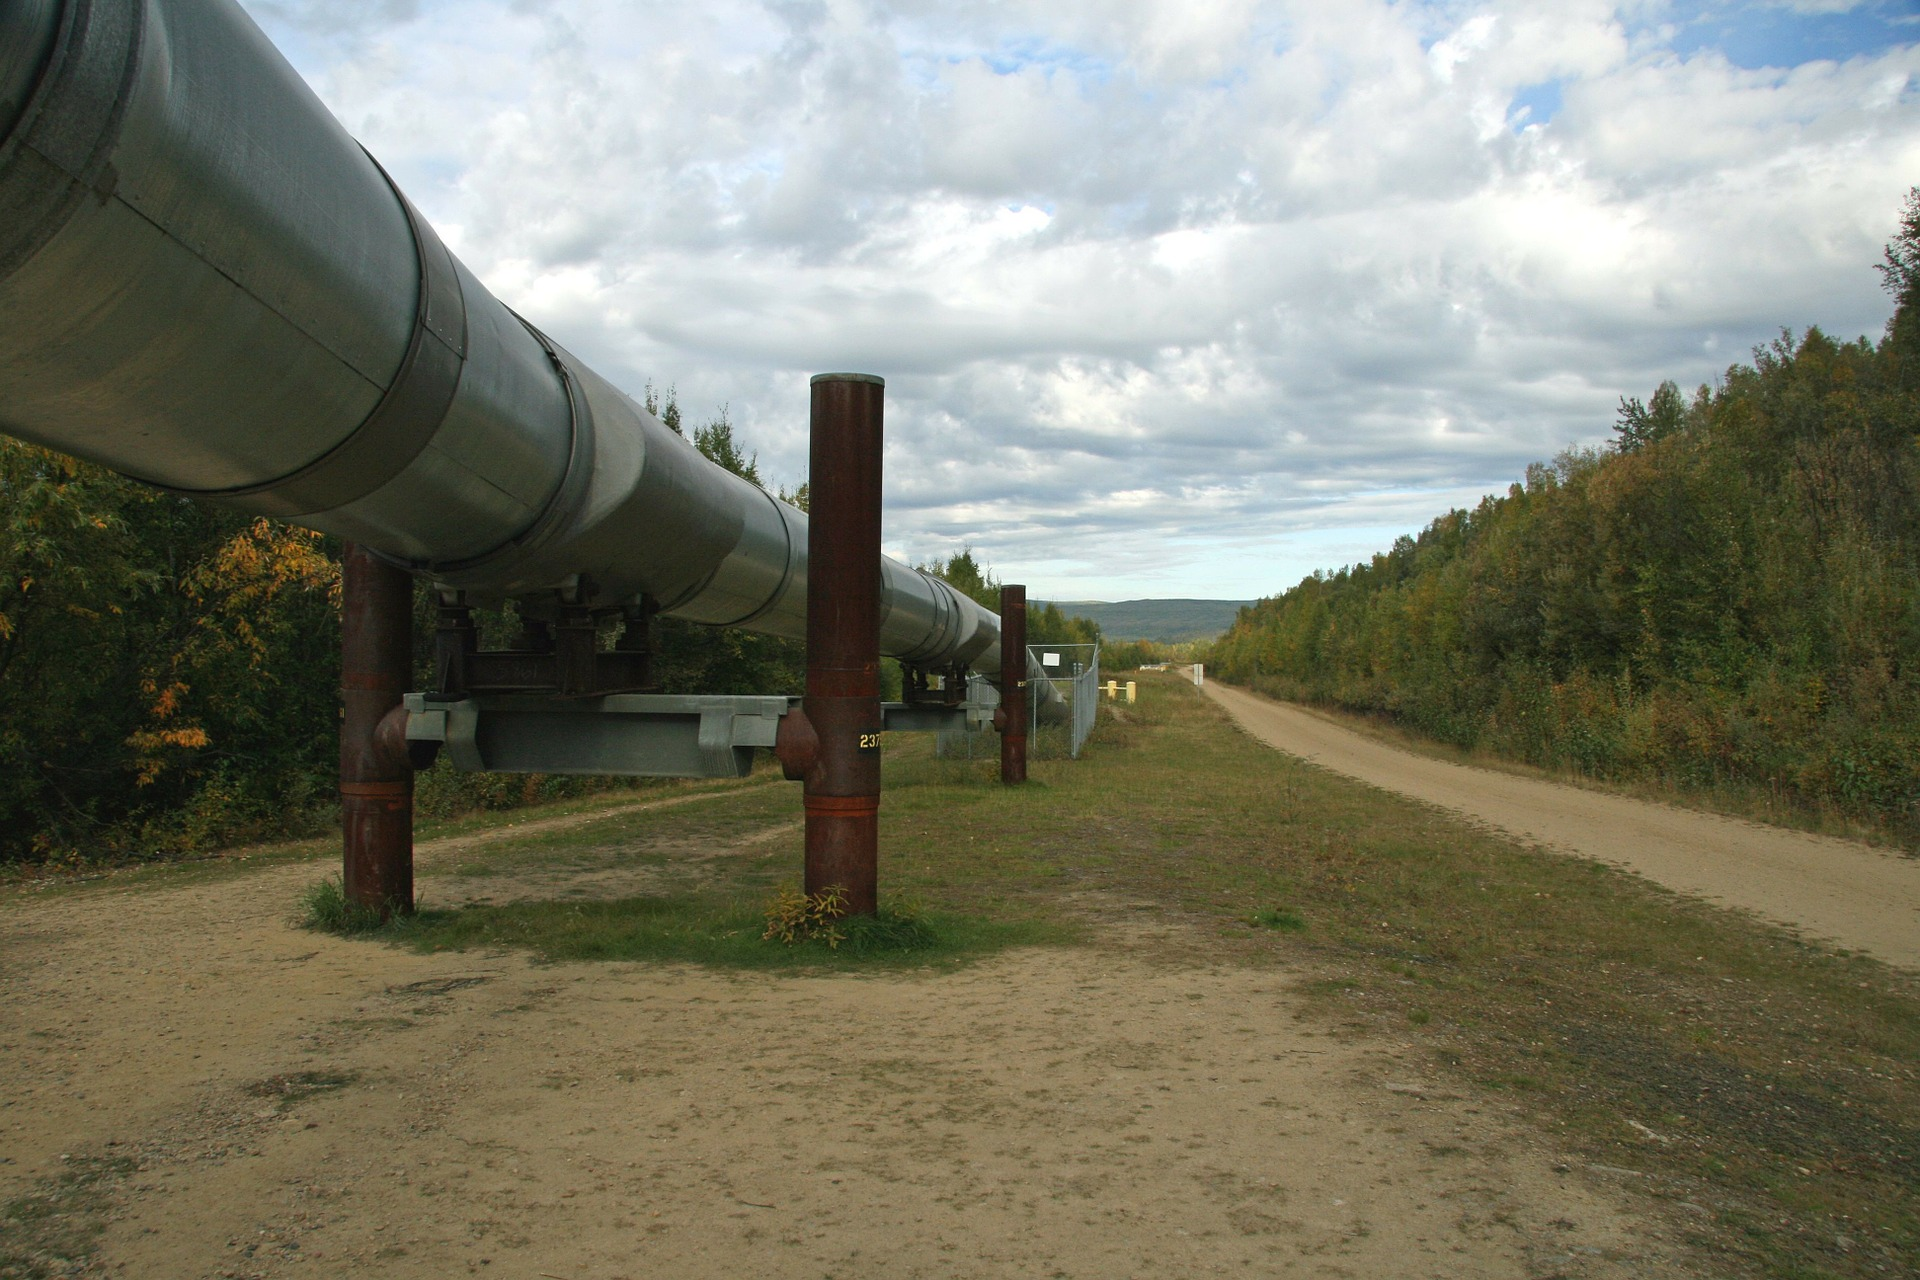 A pipeline running through fields of land.